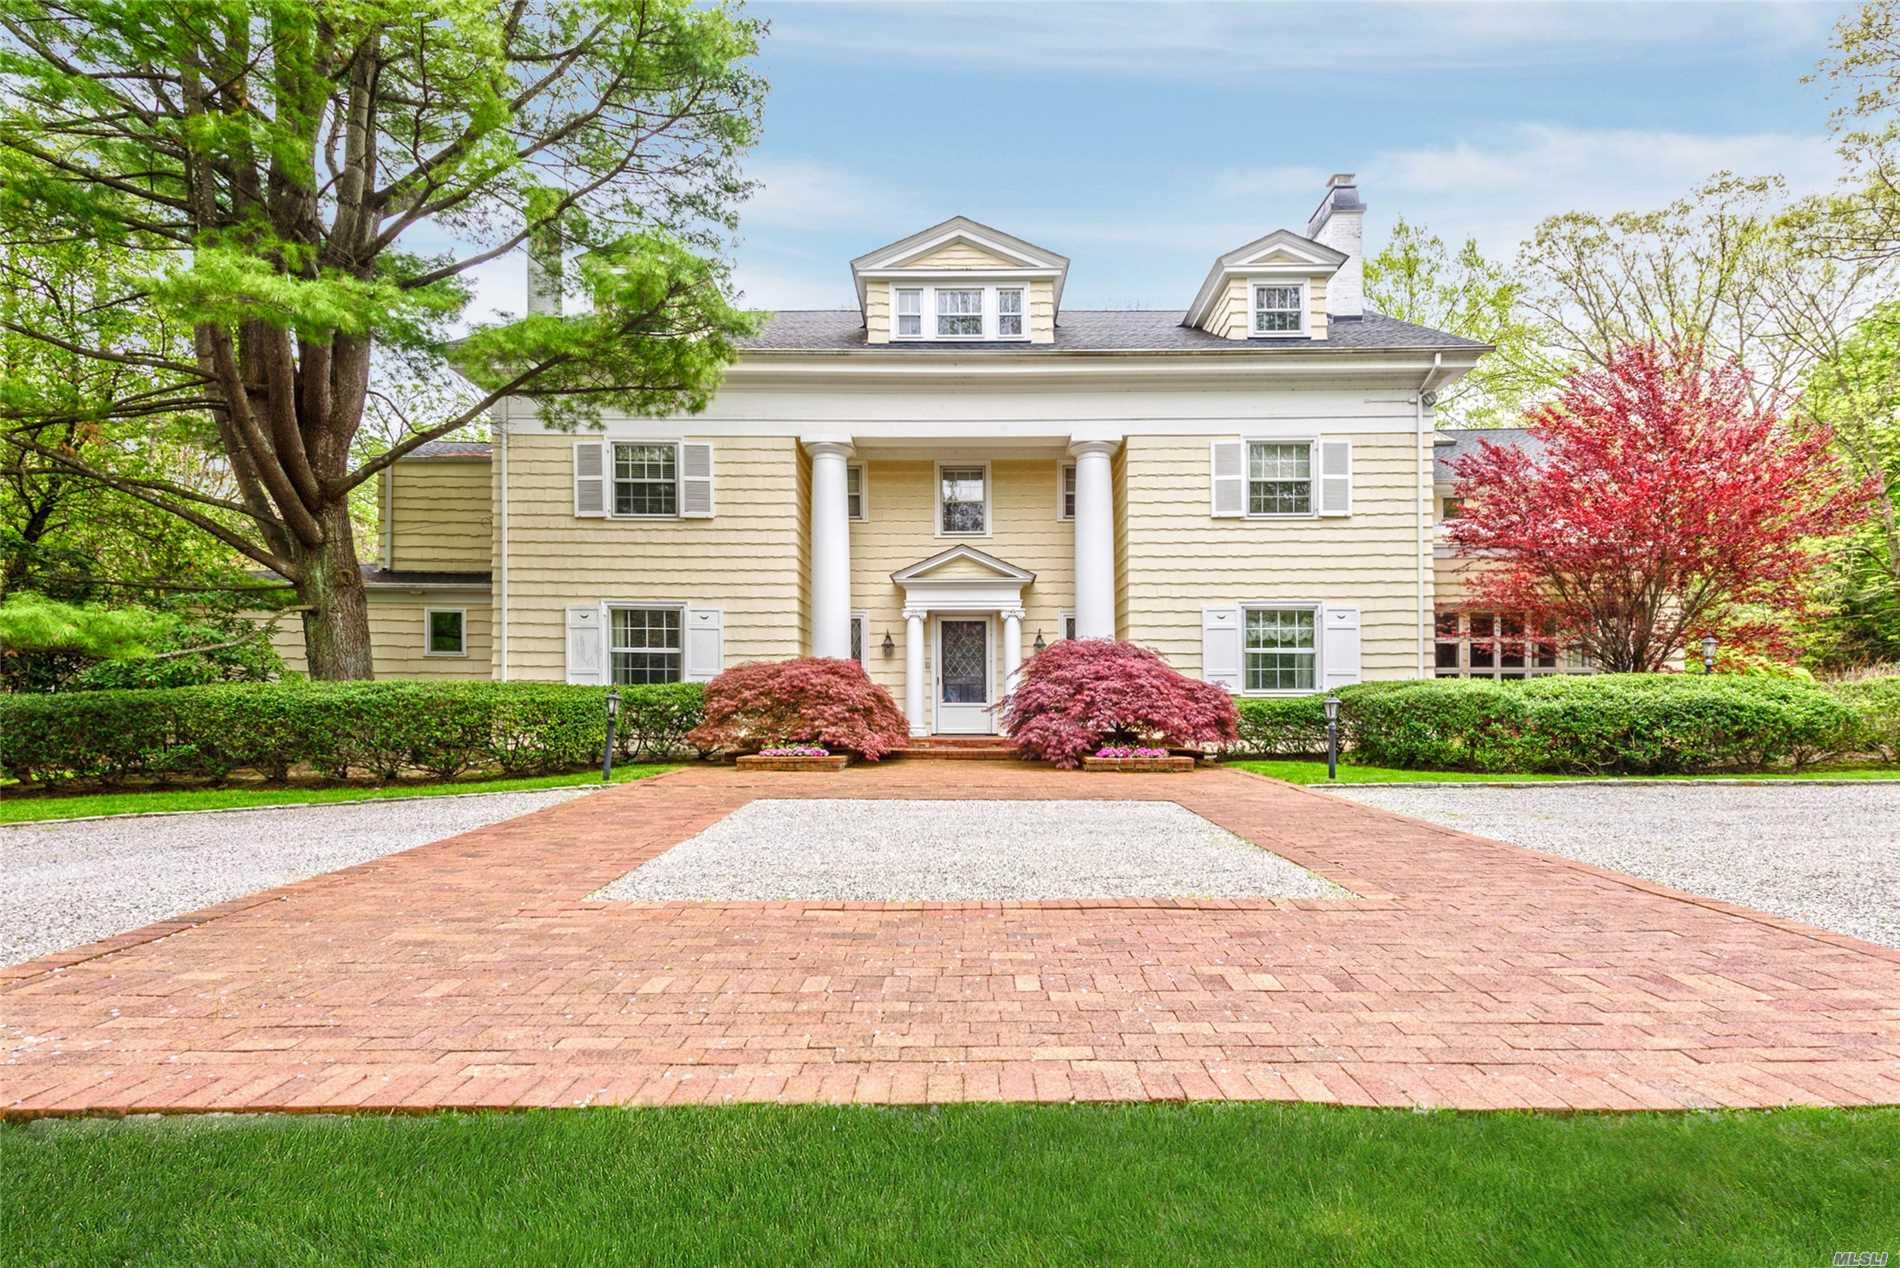 8 The Dogwoods Roslyn Estates, NY 11576